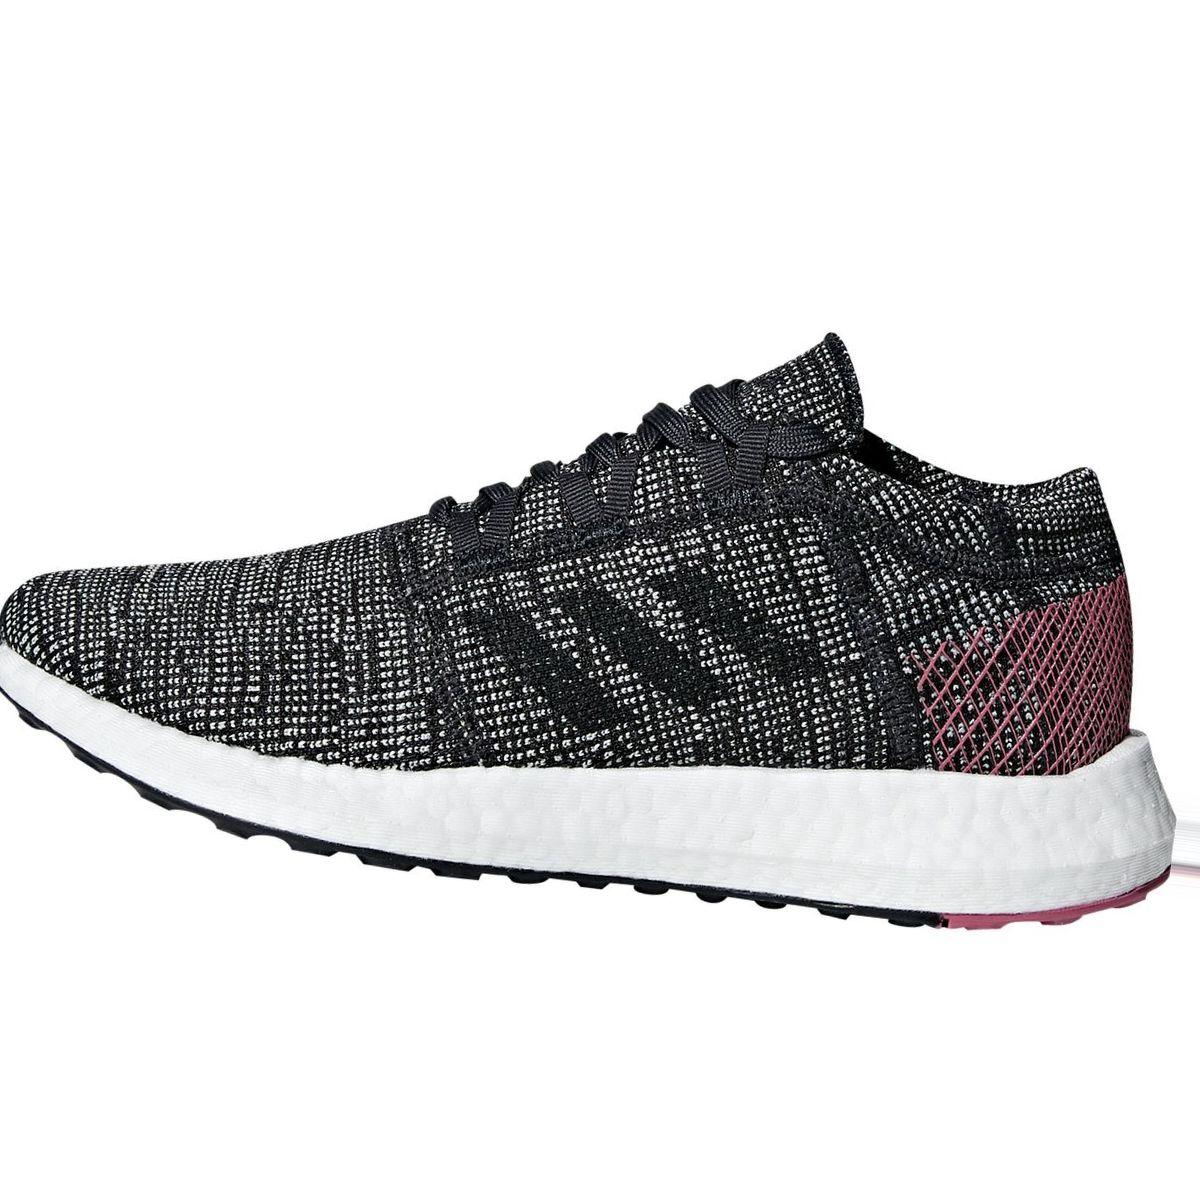 Adidas Pureboost Element Running Shoe - Women's